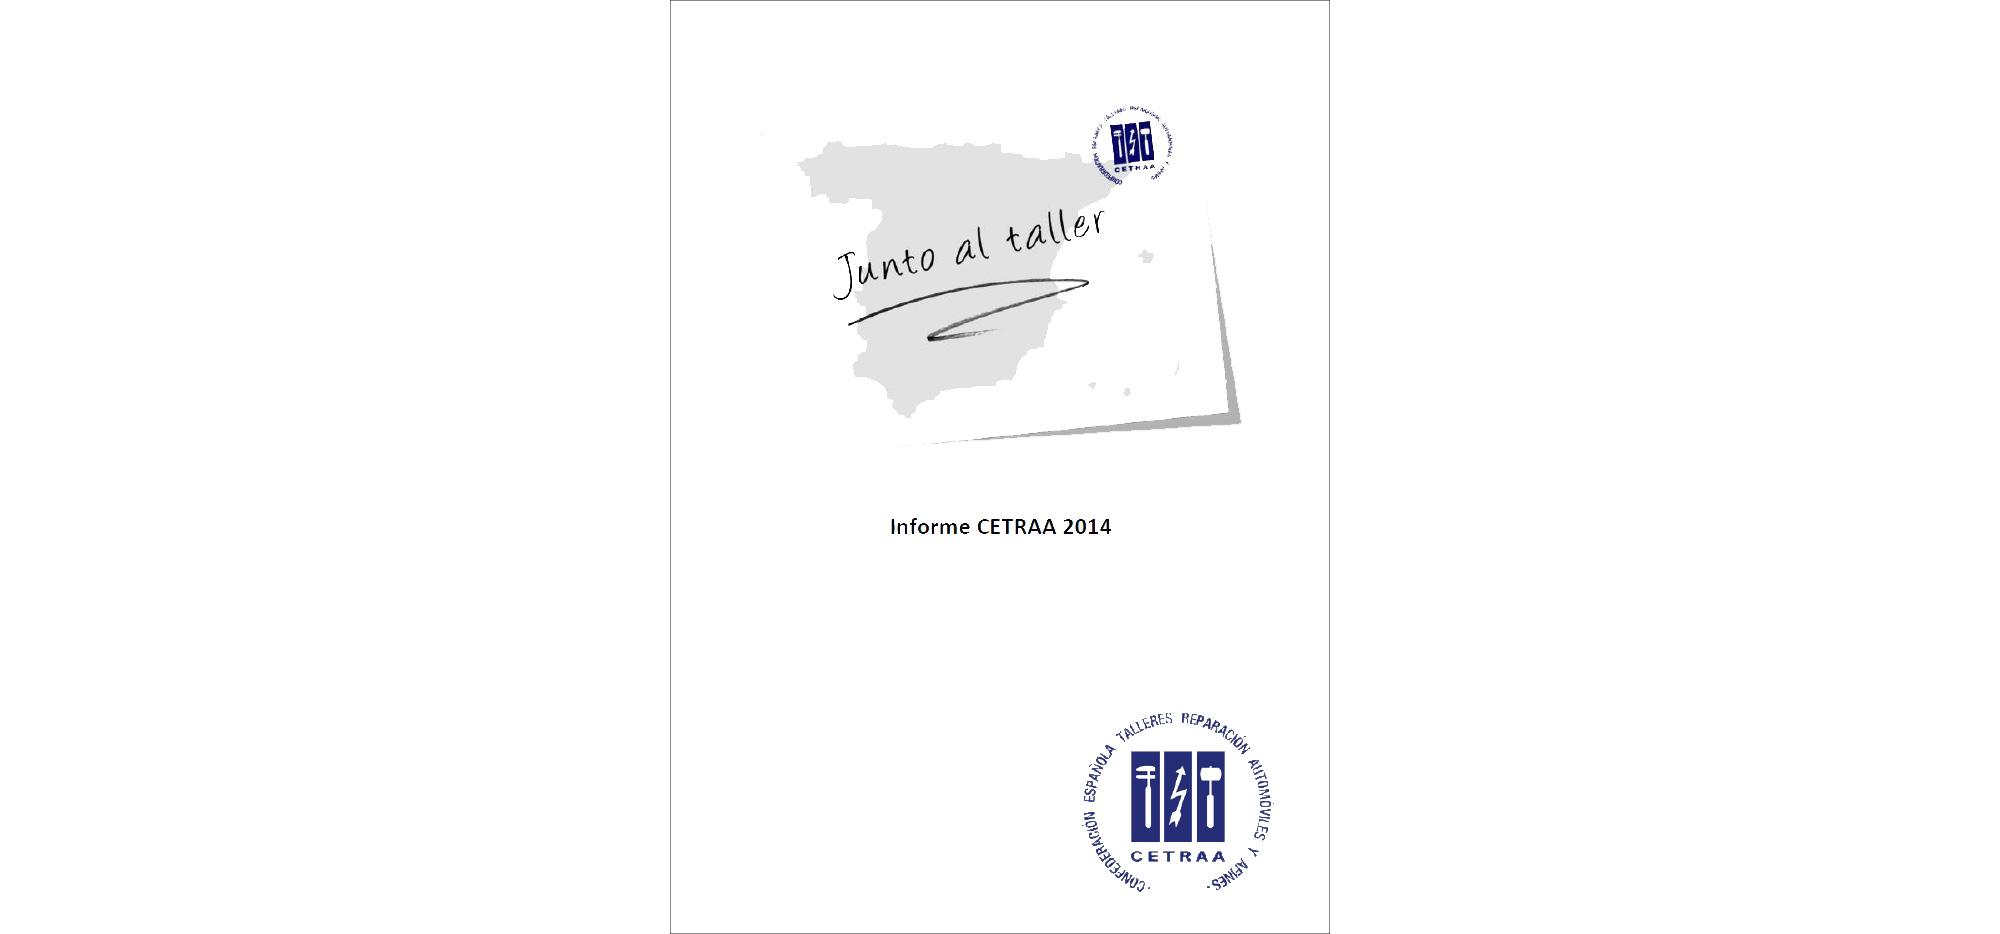 Informe CETRAA 2014